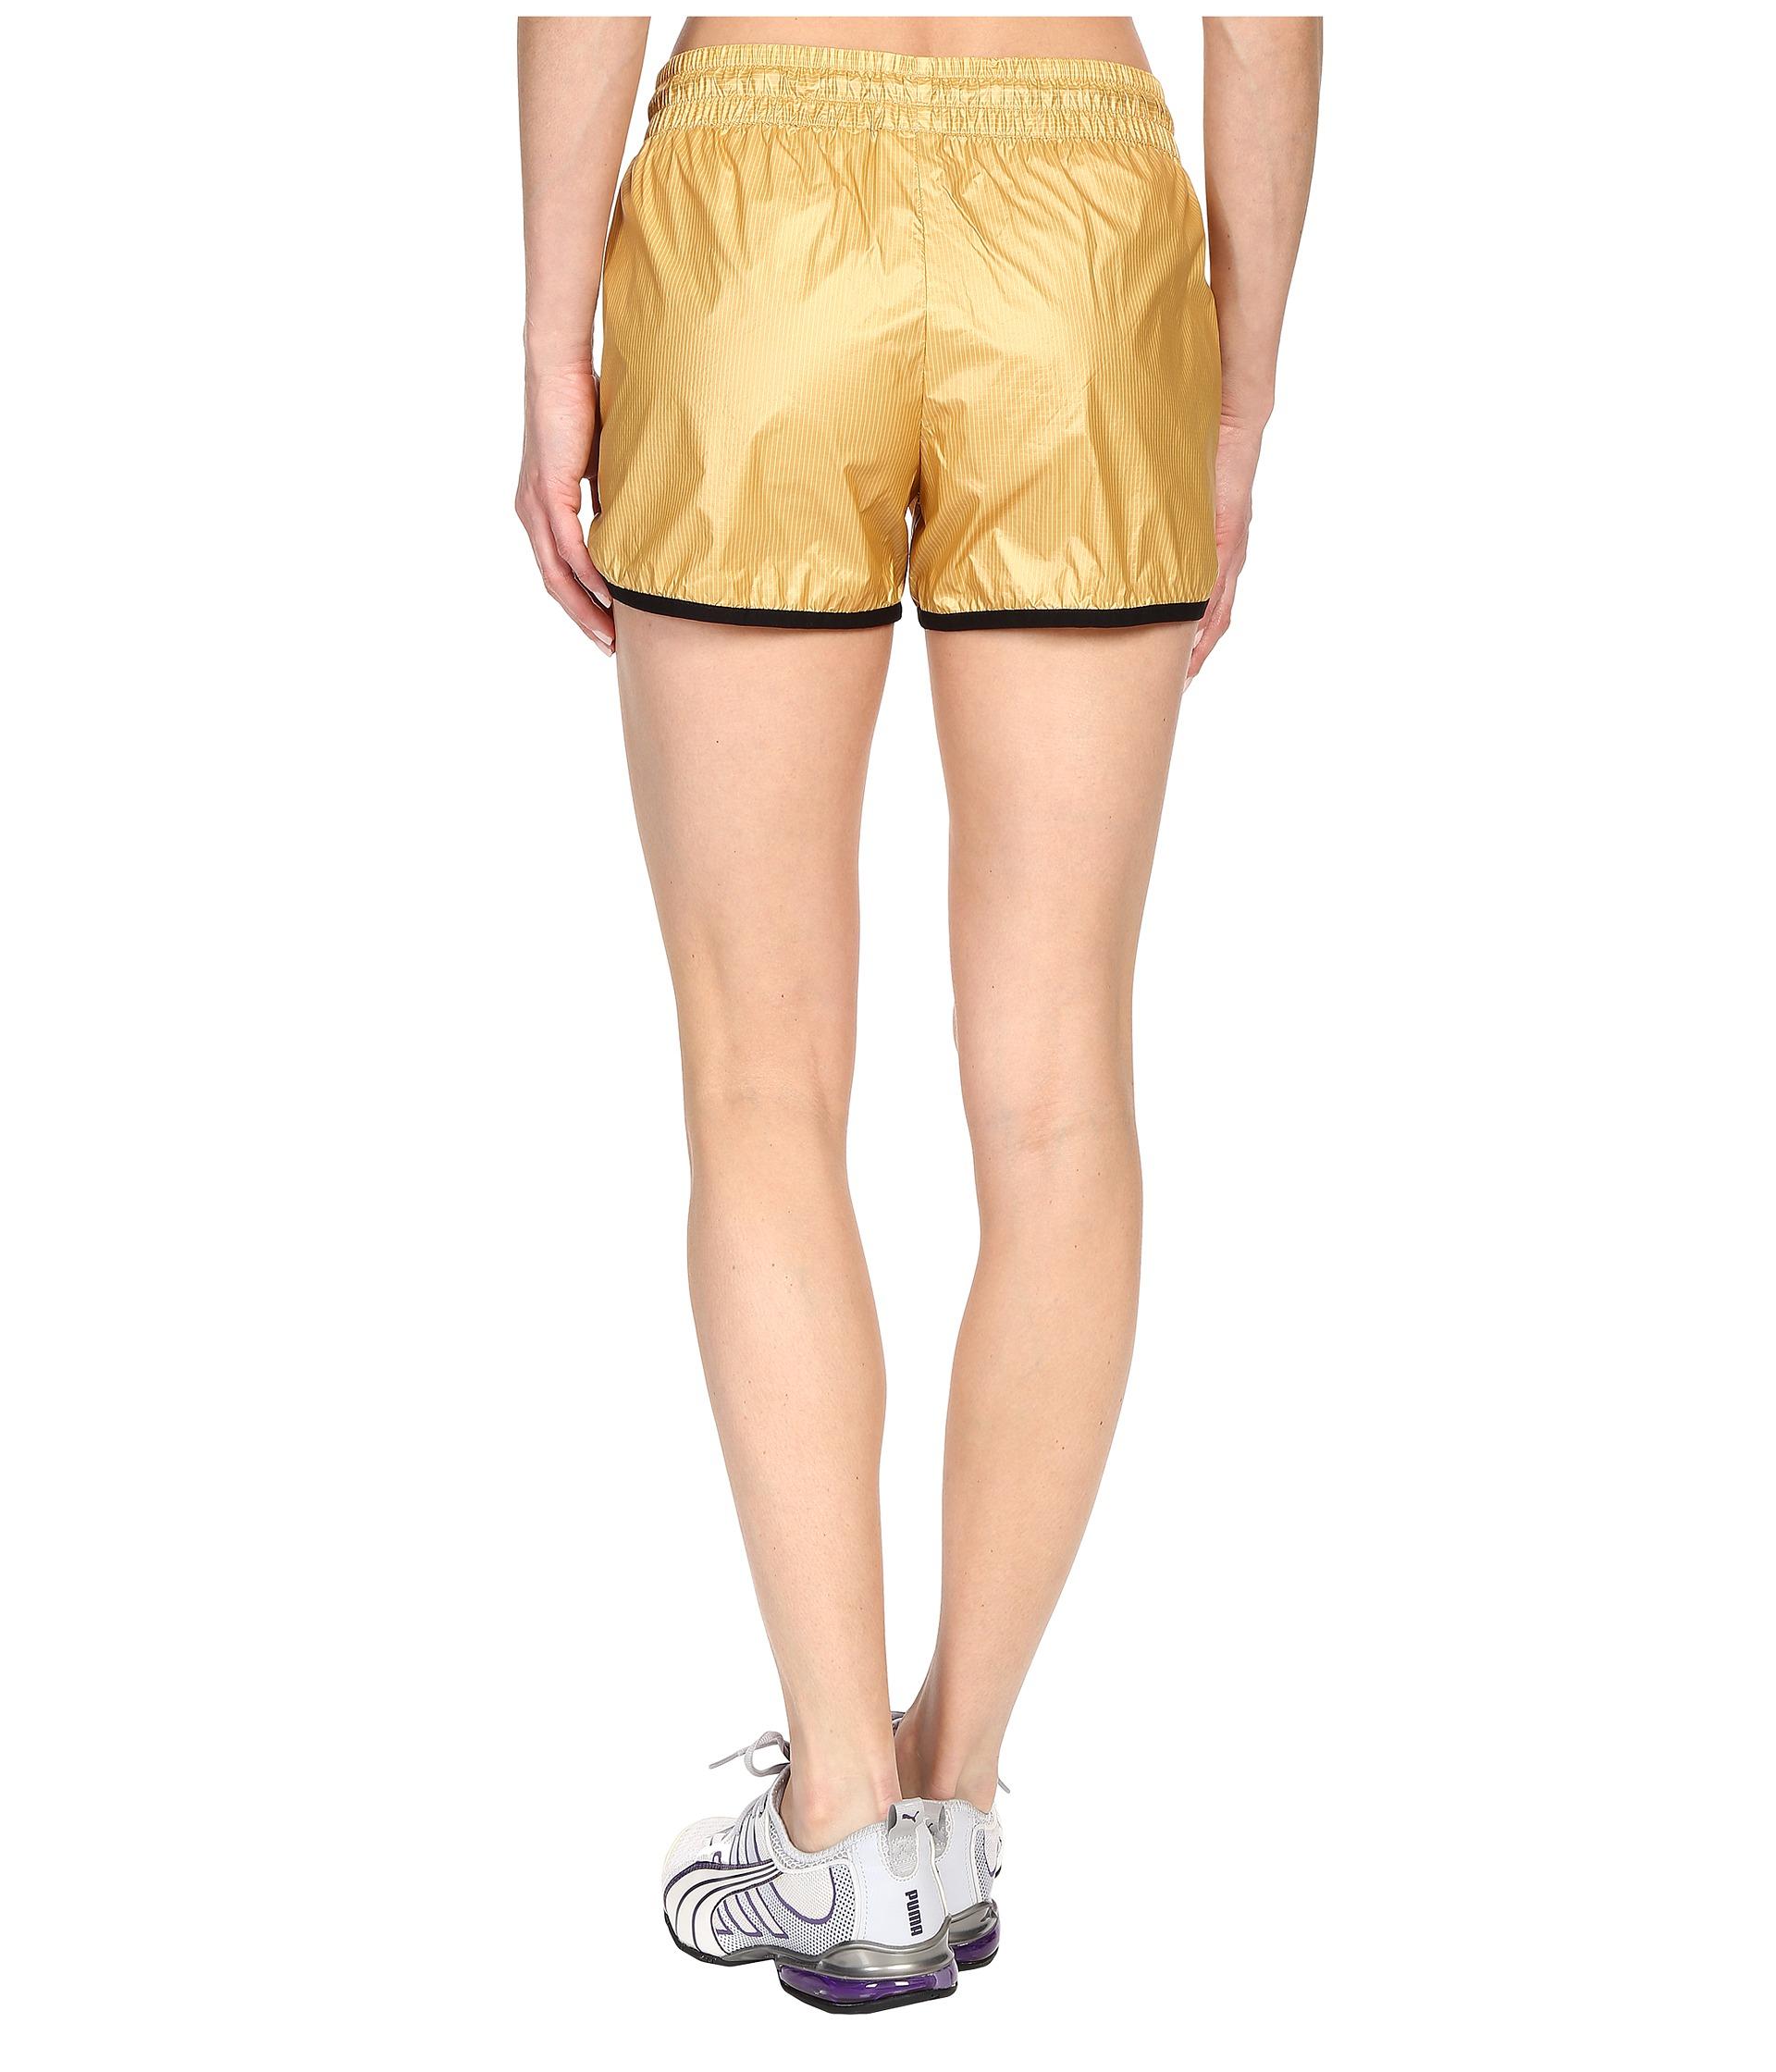 acdd05172493 Lyst - PUMA Gold Shorts in Metallic